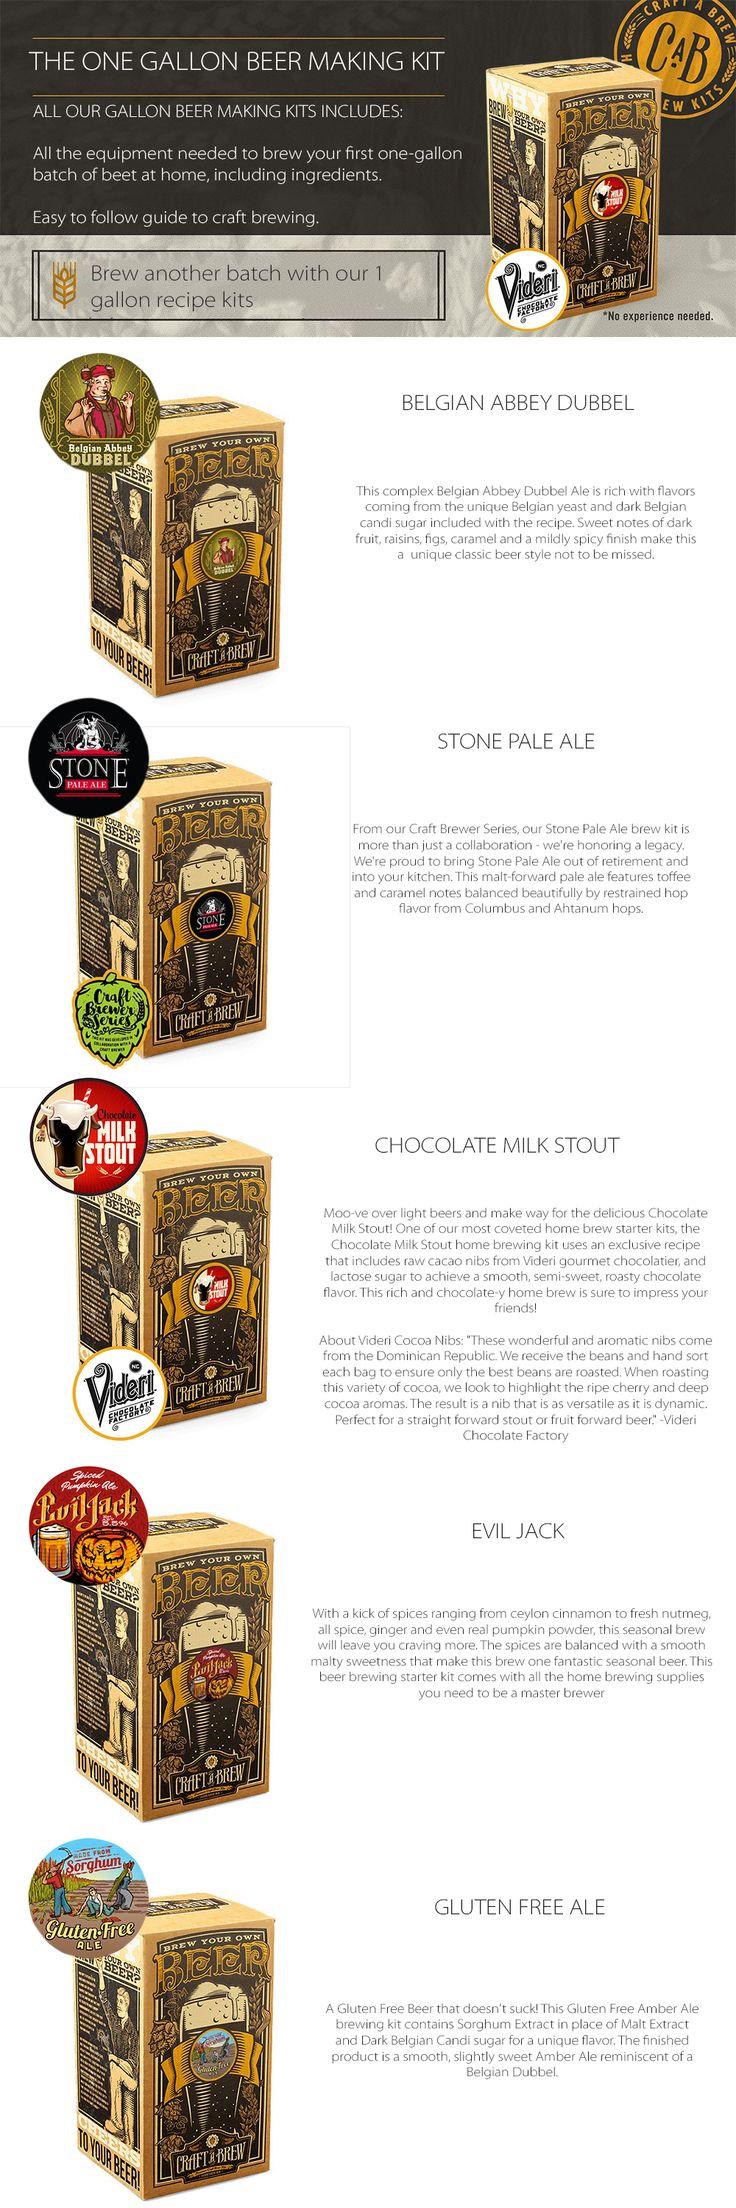 Beer Brewing Kits II Make One Gallon Beer